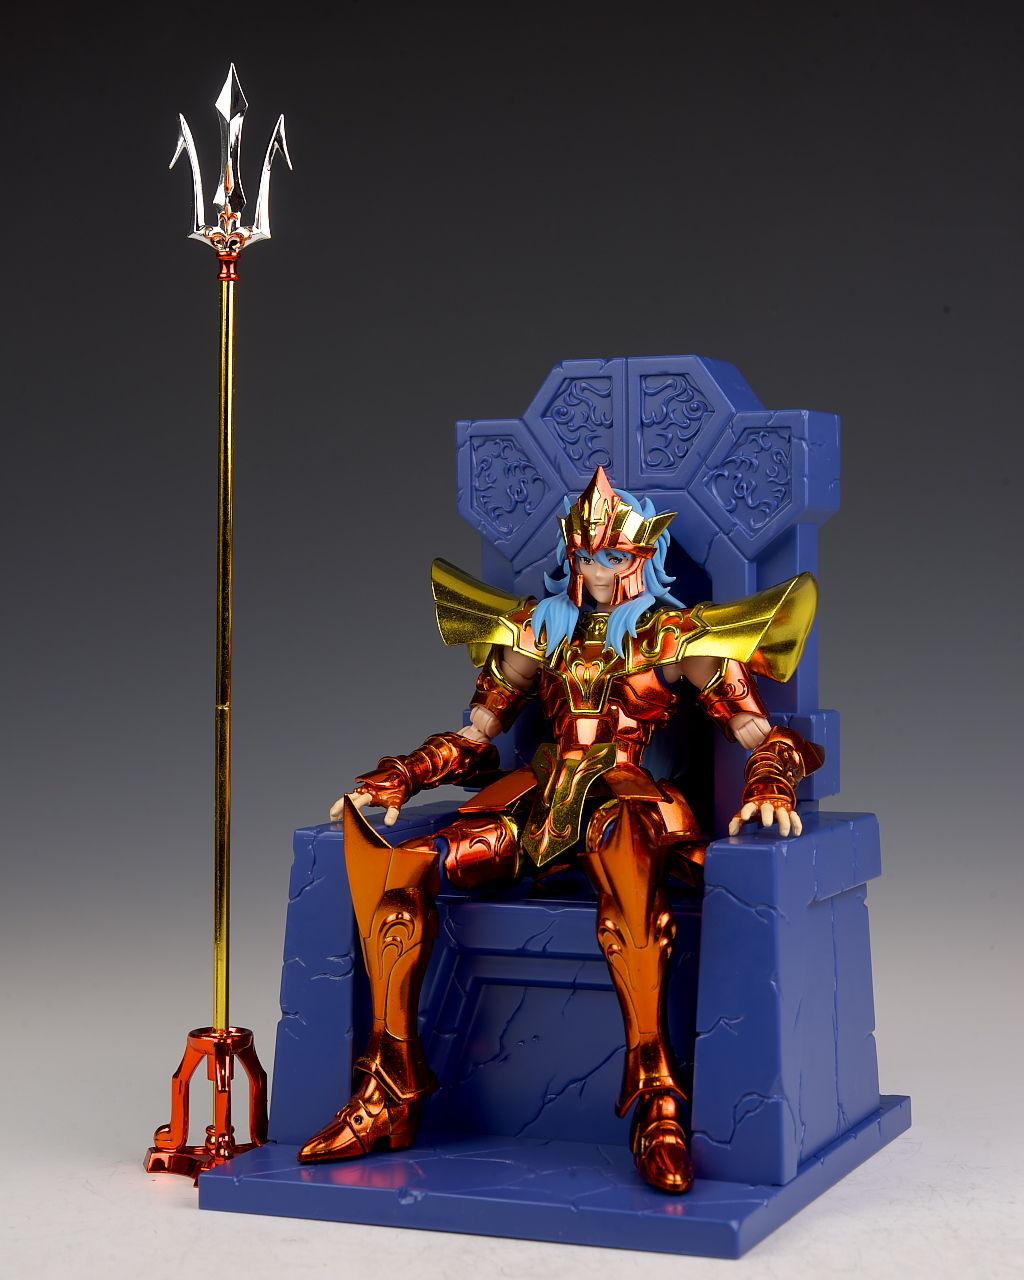 [Comentários] Saint Cloth Myth EX - Poseidon EX & Poseidon EX Imperial Throne Set - Página 2 7GavekaJ_o